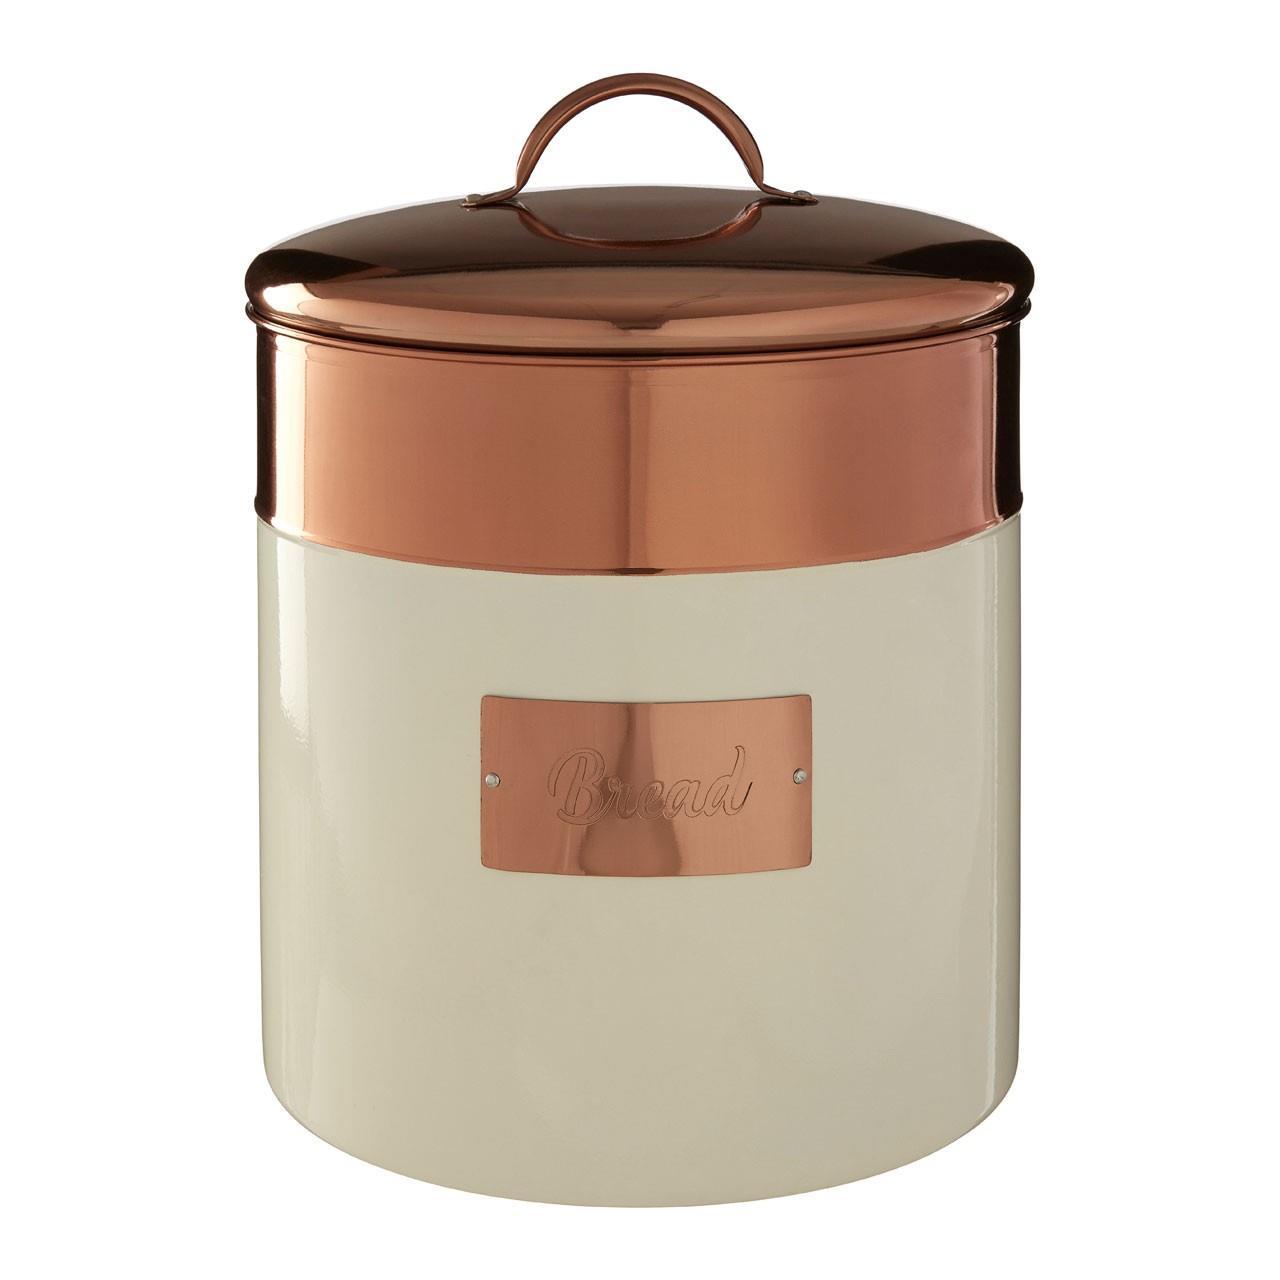 Prescott-Cream-Copper-Bread-Bin-Biscuit-Sugar-Coffee-Canister-Utensil-Holder thumbnail 6